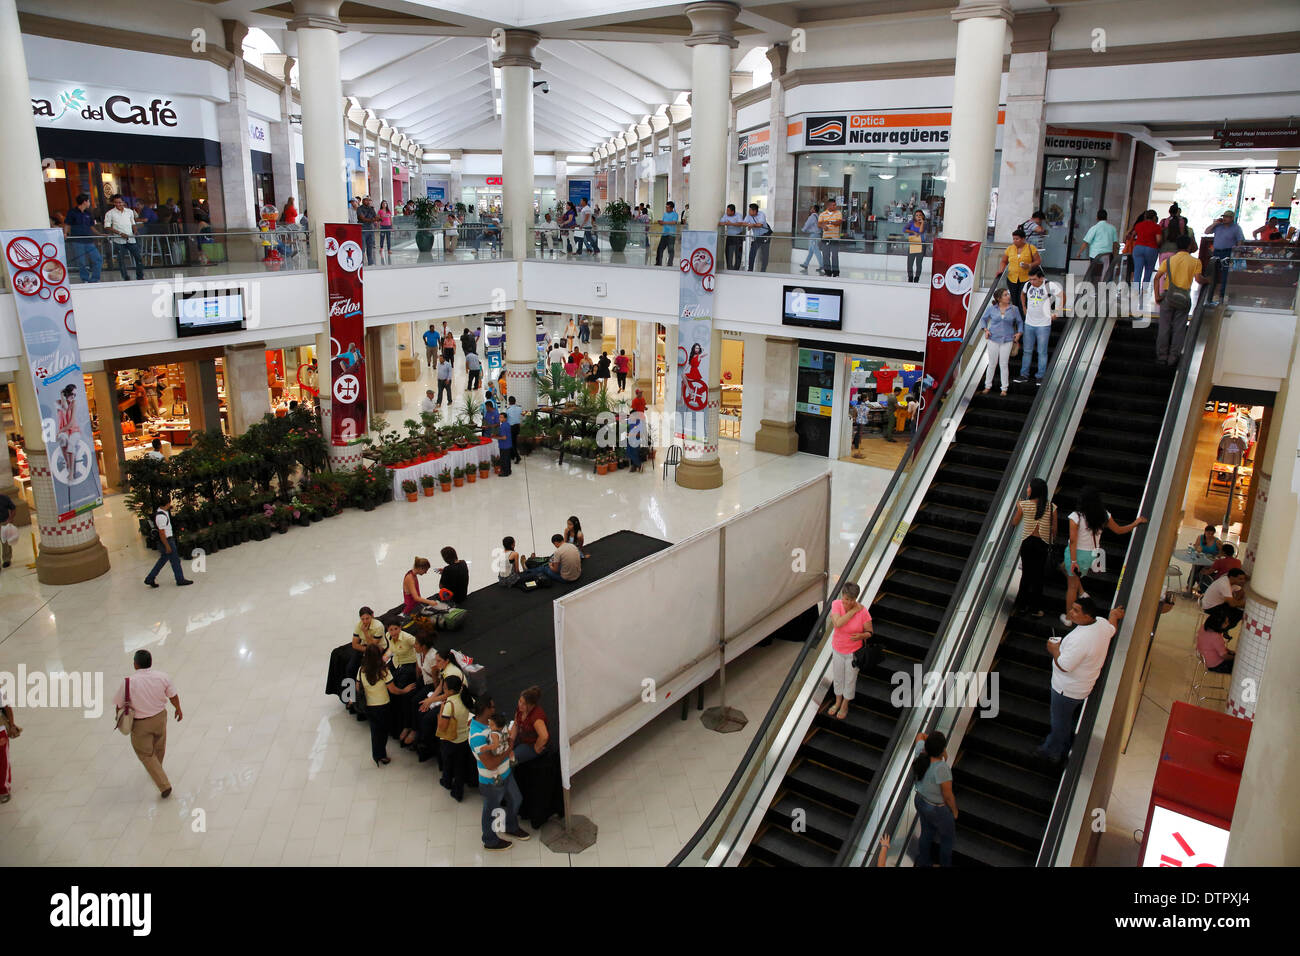 Metrocentro shopping mall, Managua Nicaragua Stock Photo